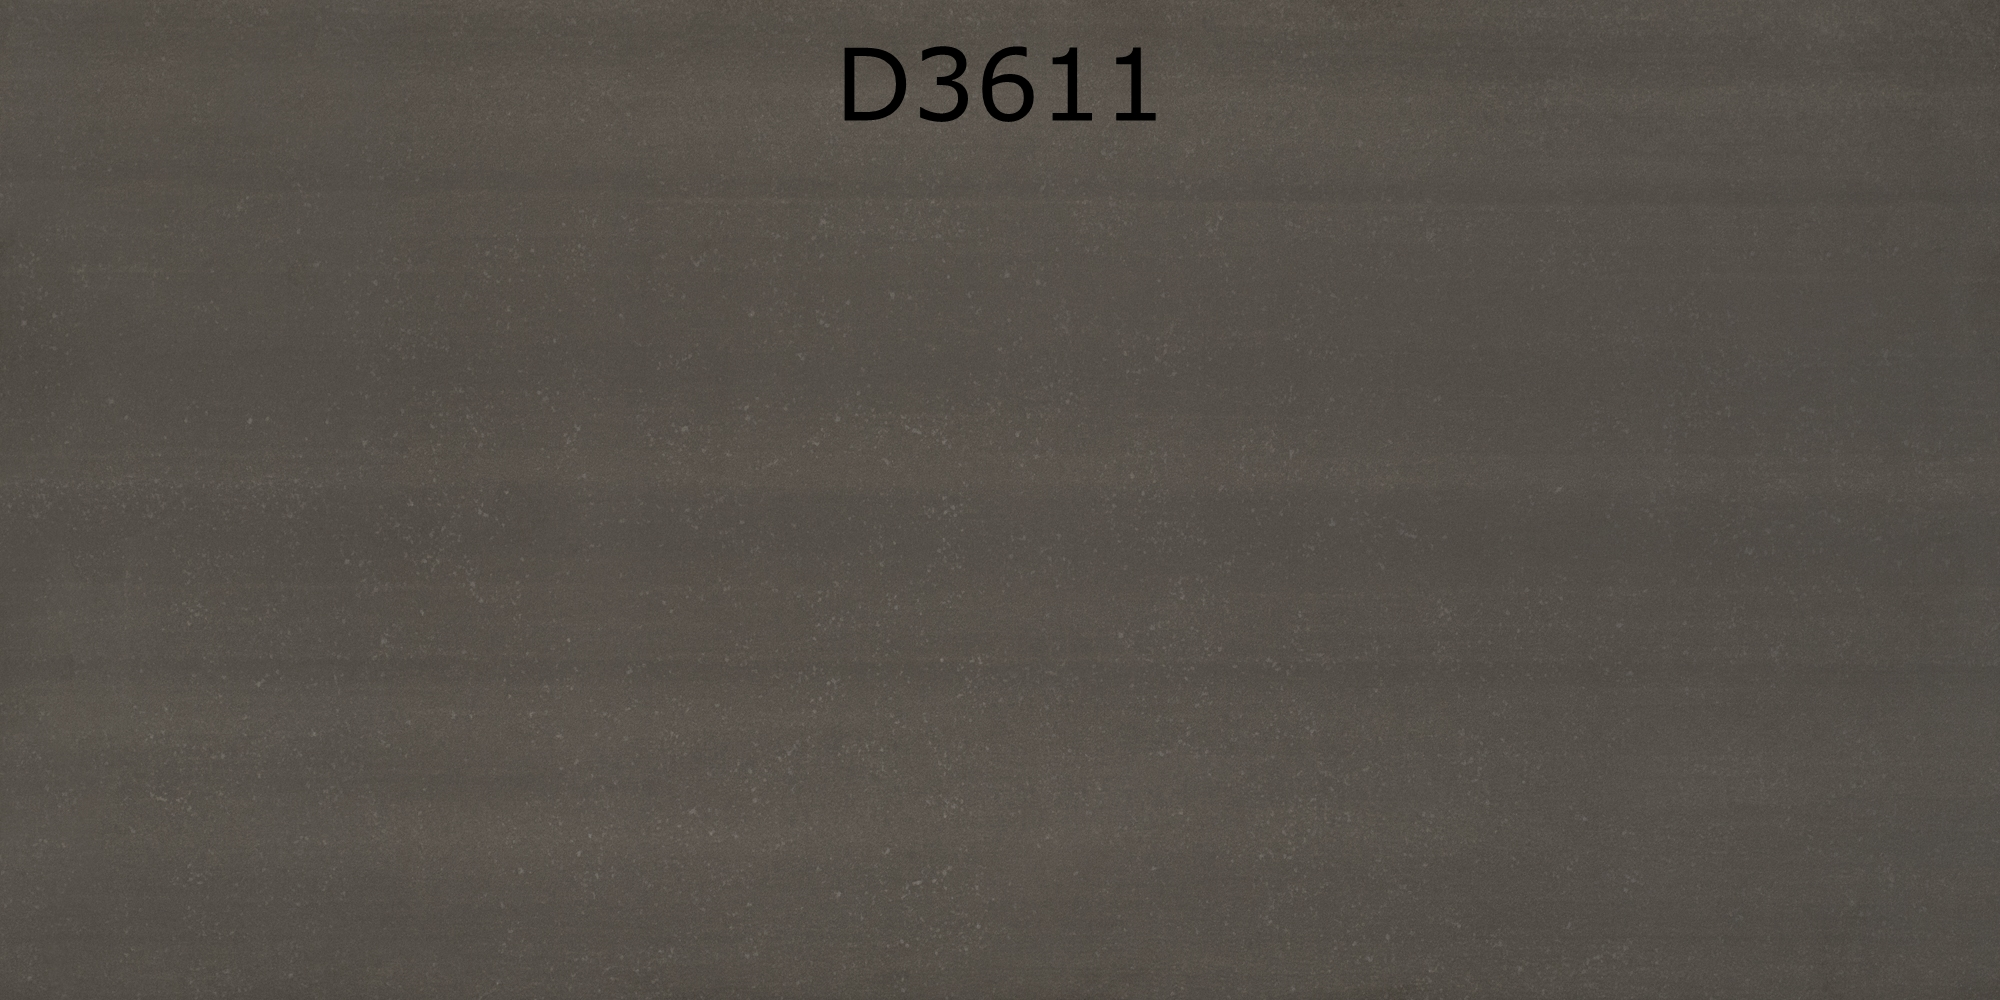 D3611